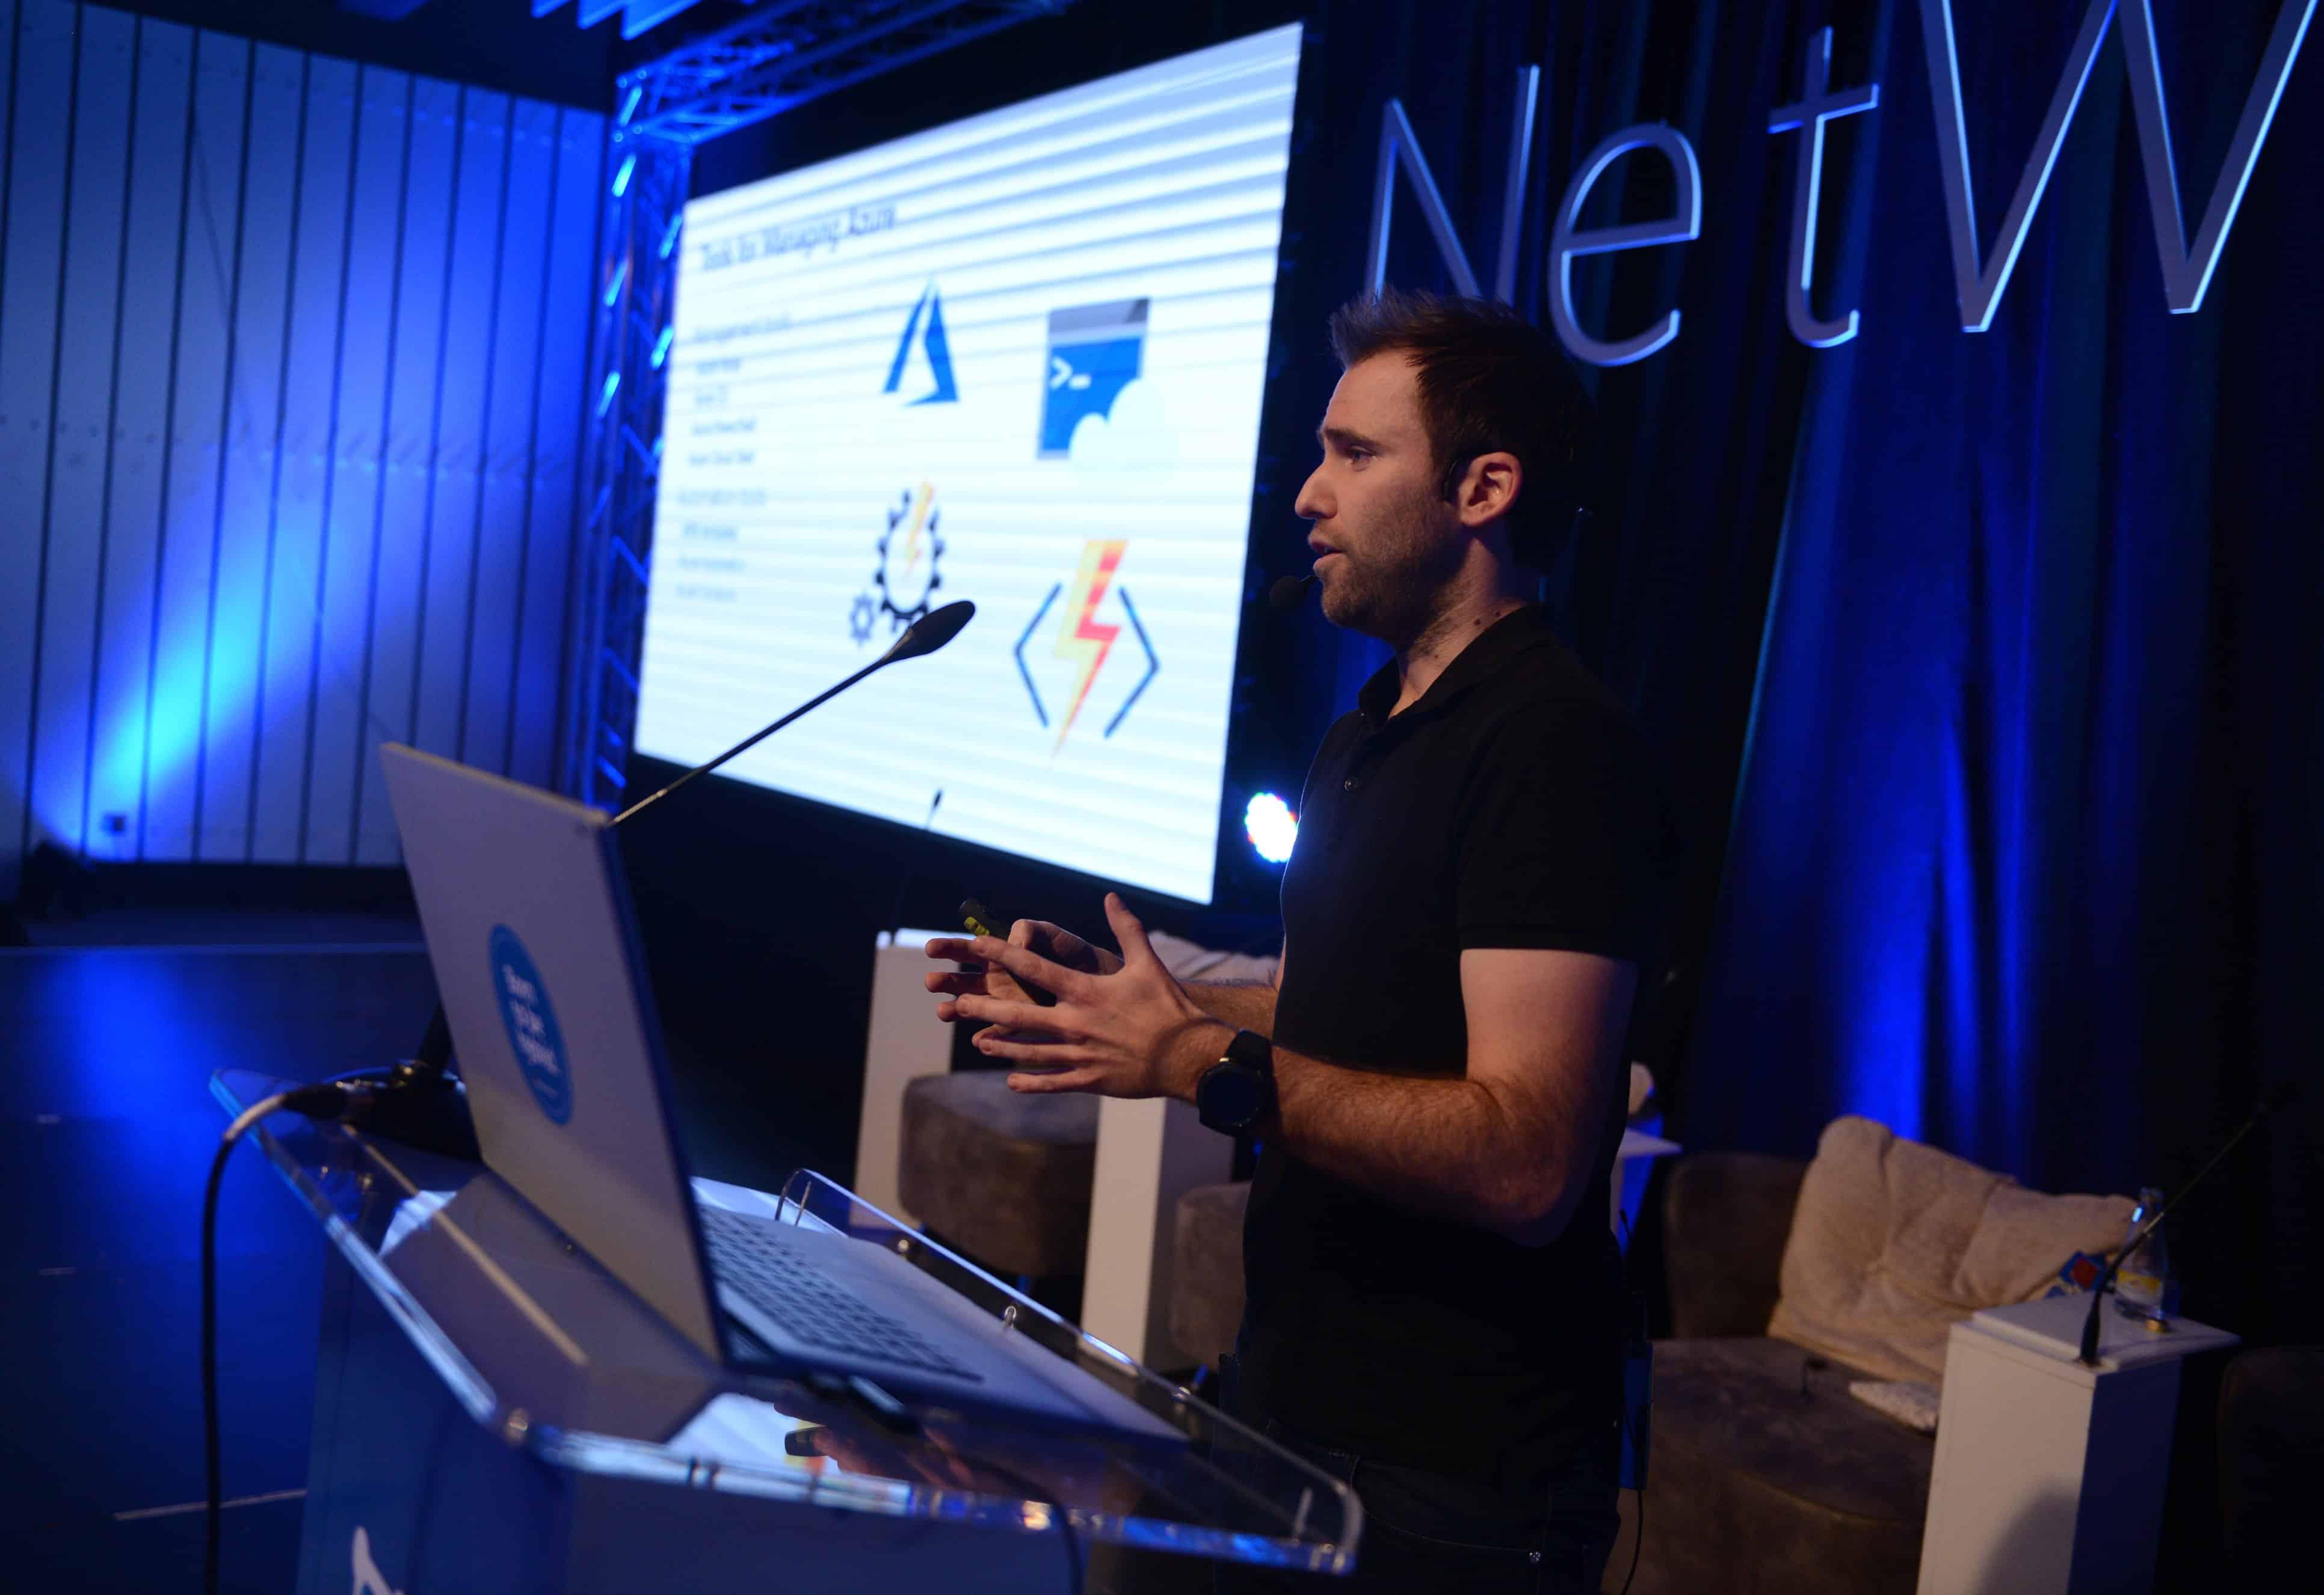 Thomas Maurer speaking Microsoft Network 9